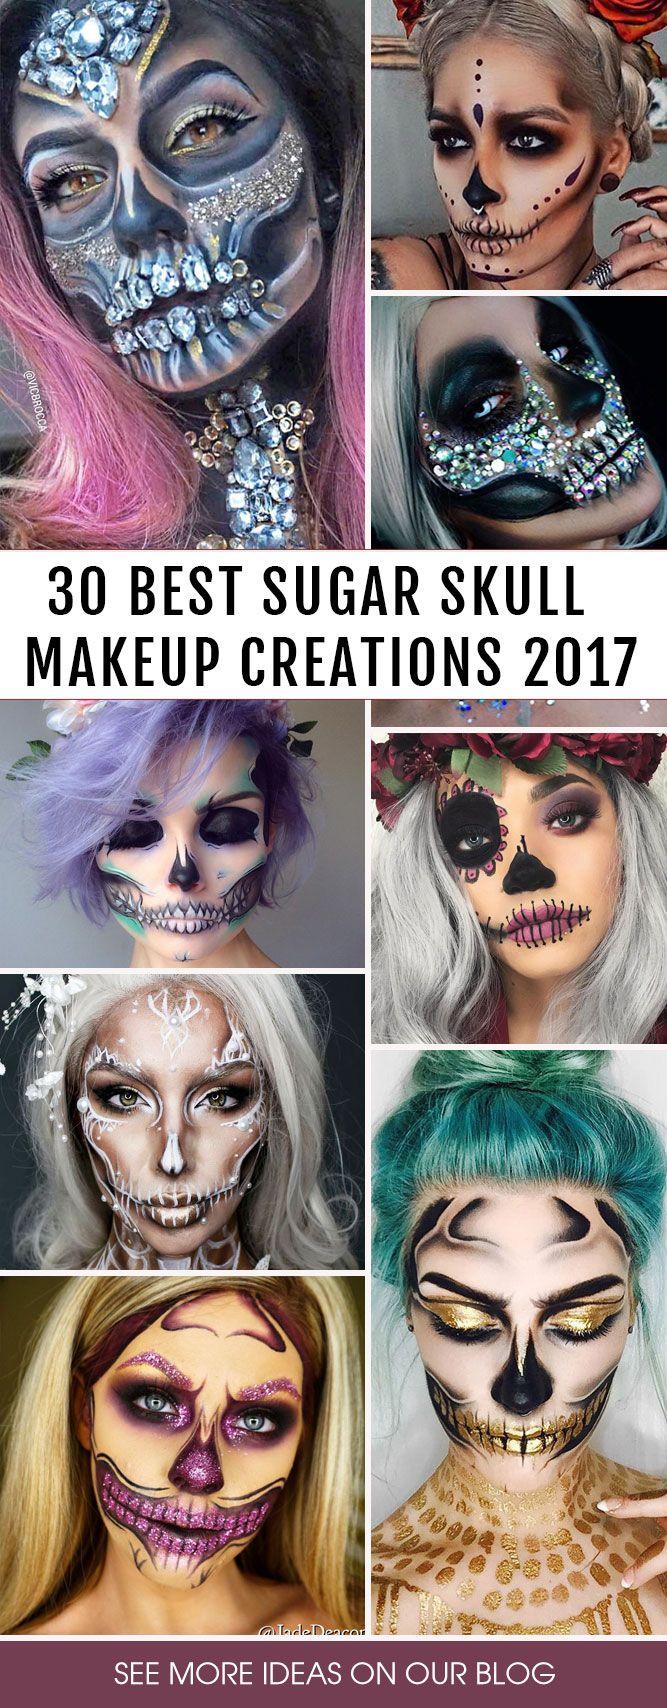 36 Best Sugar Skull Makeup Of This Season | Costumes